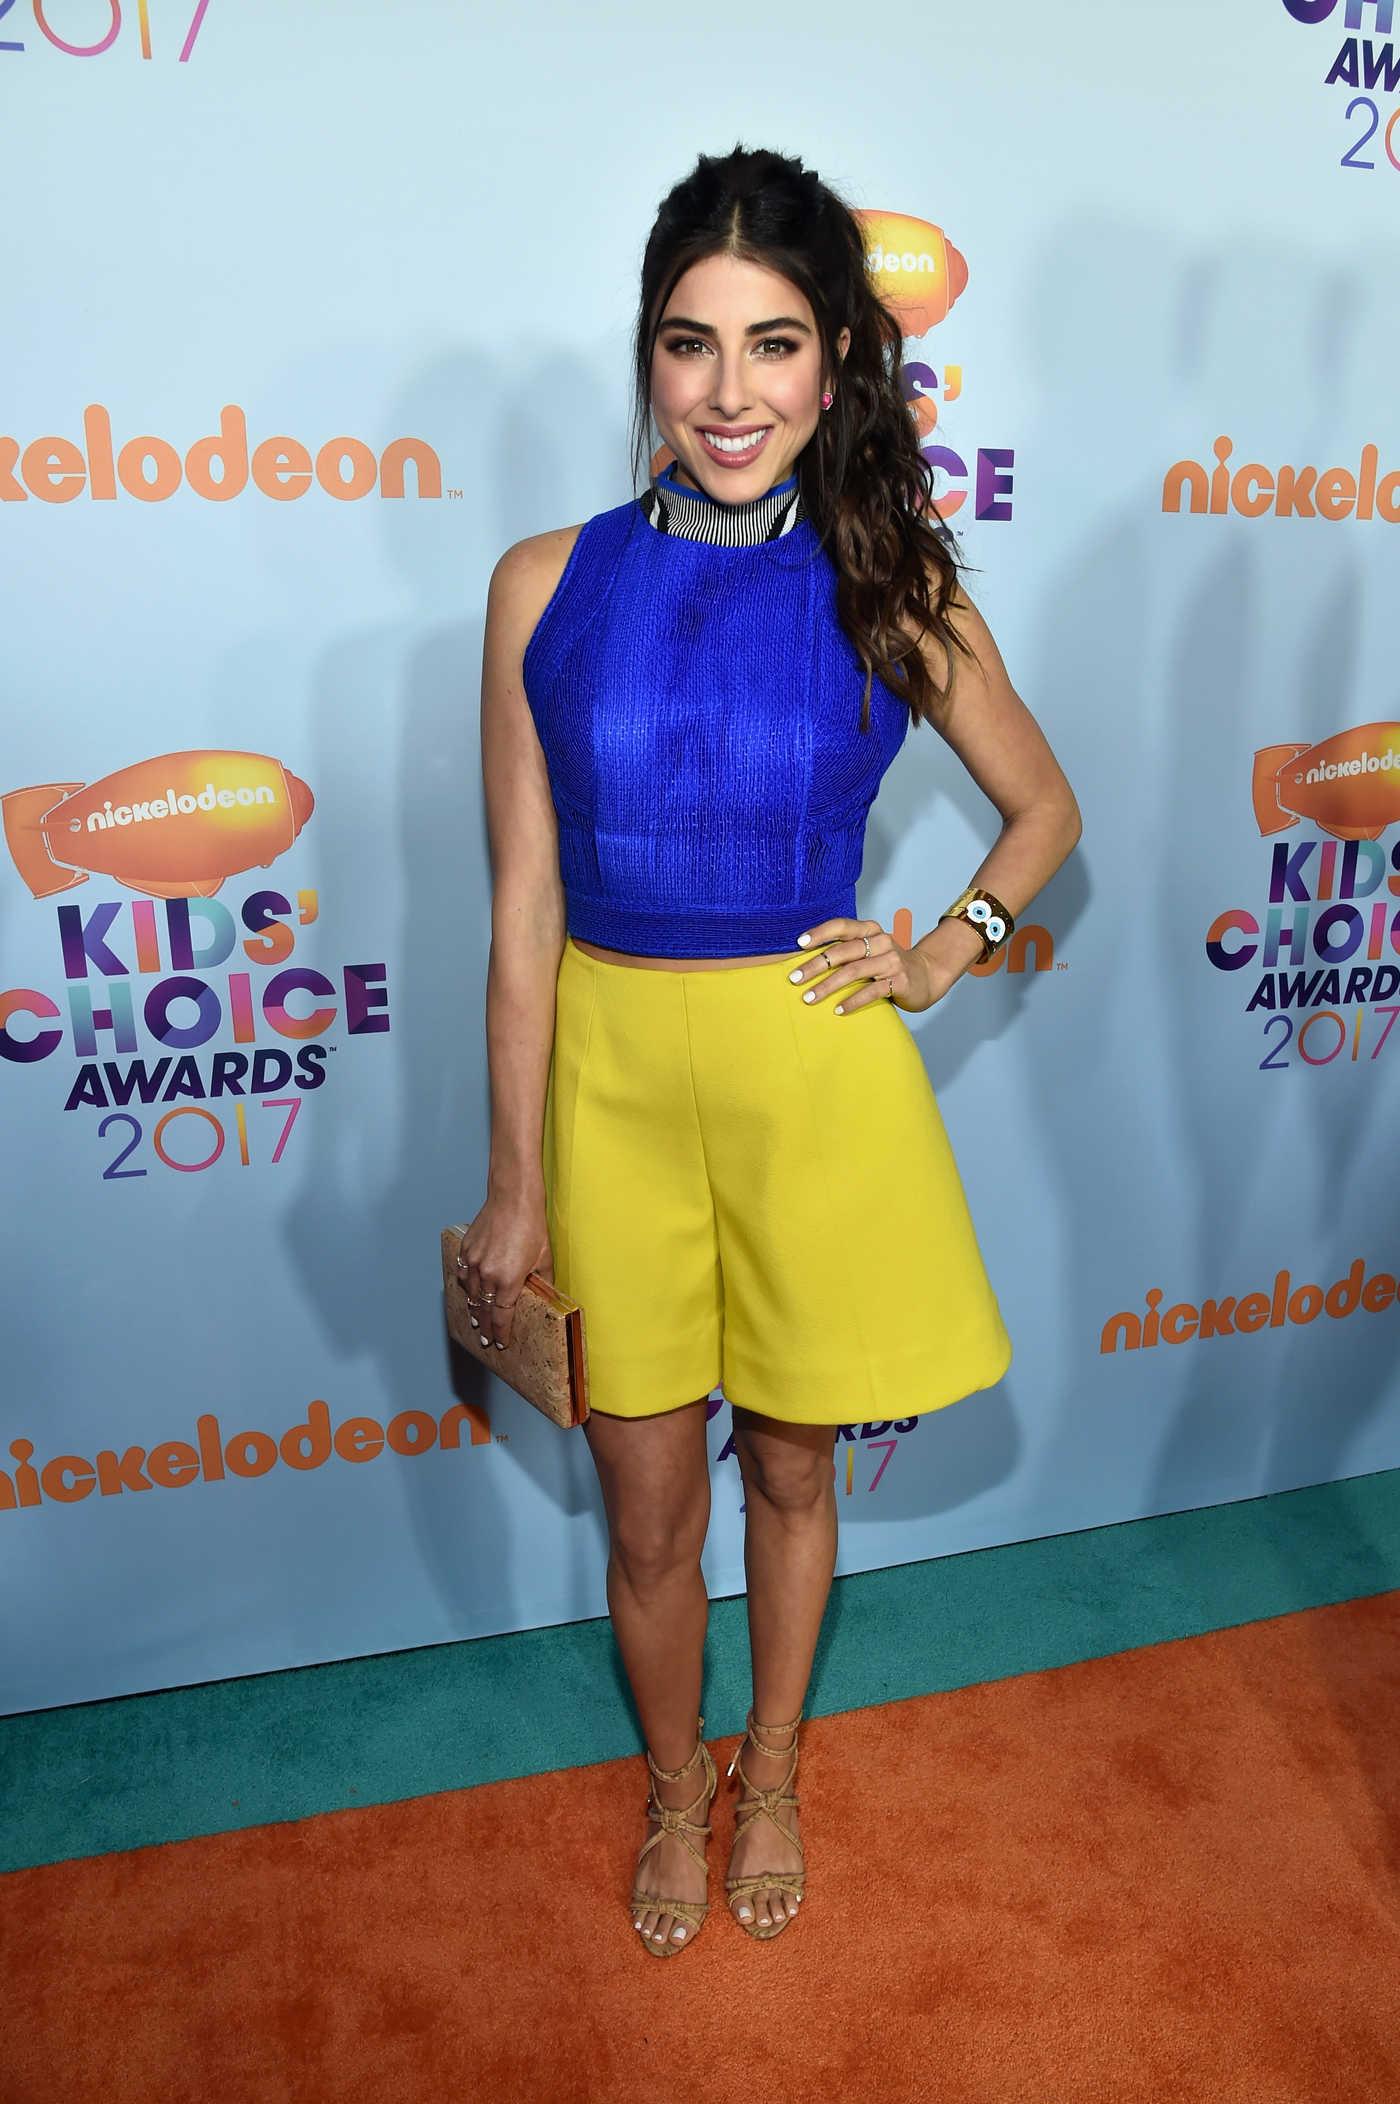 Daniella Monet at the 2017 Nickelodeon Kids' Choice Awards in Los Angeles 03/11/2017